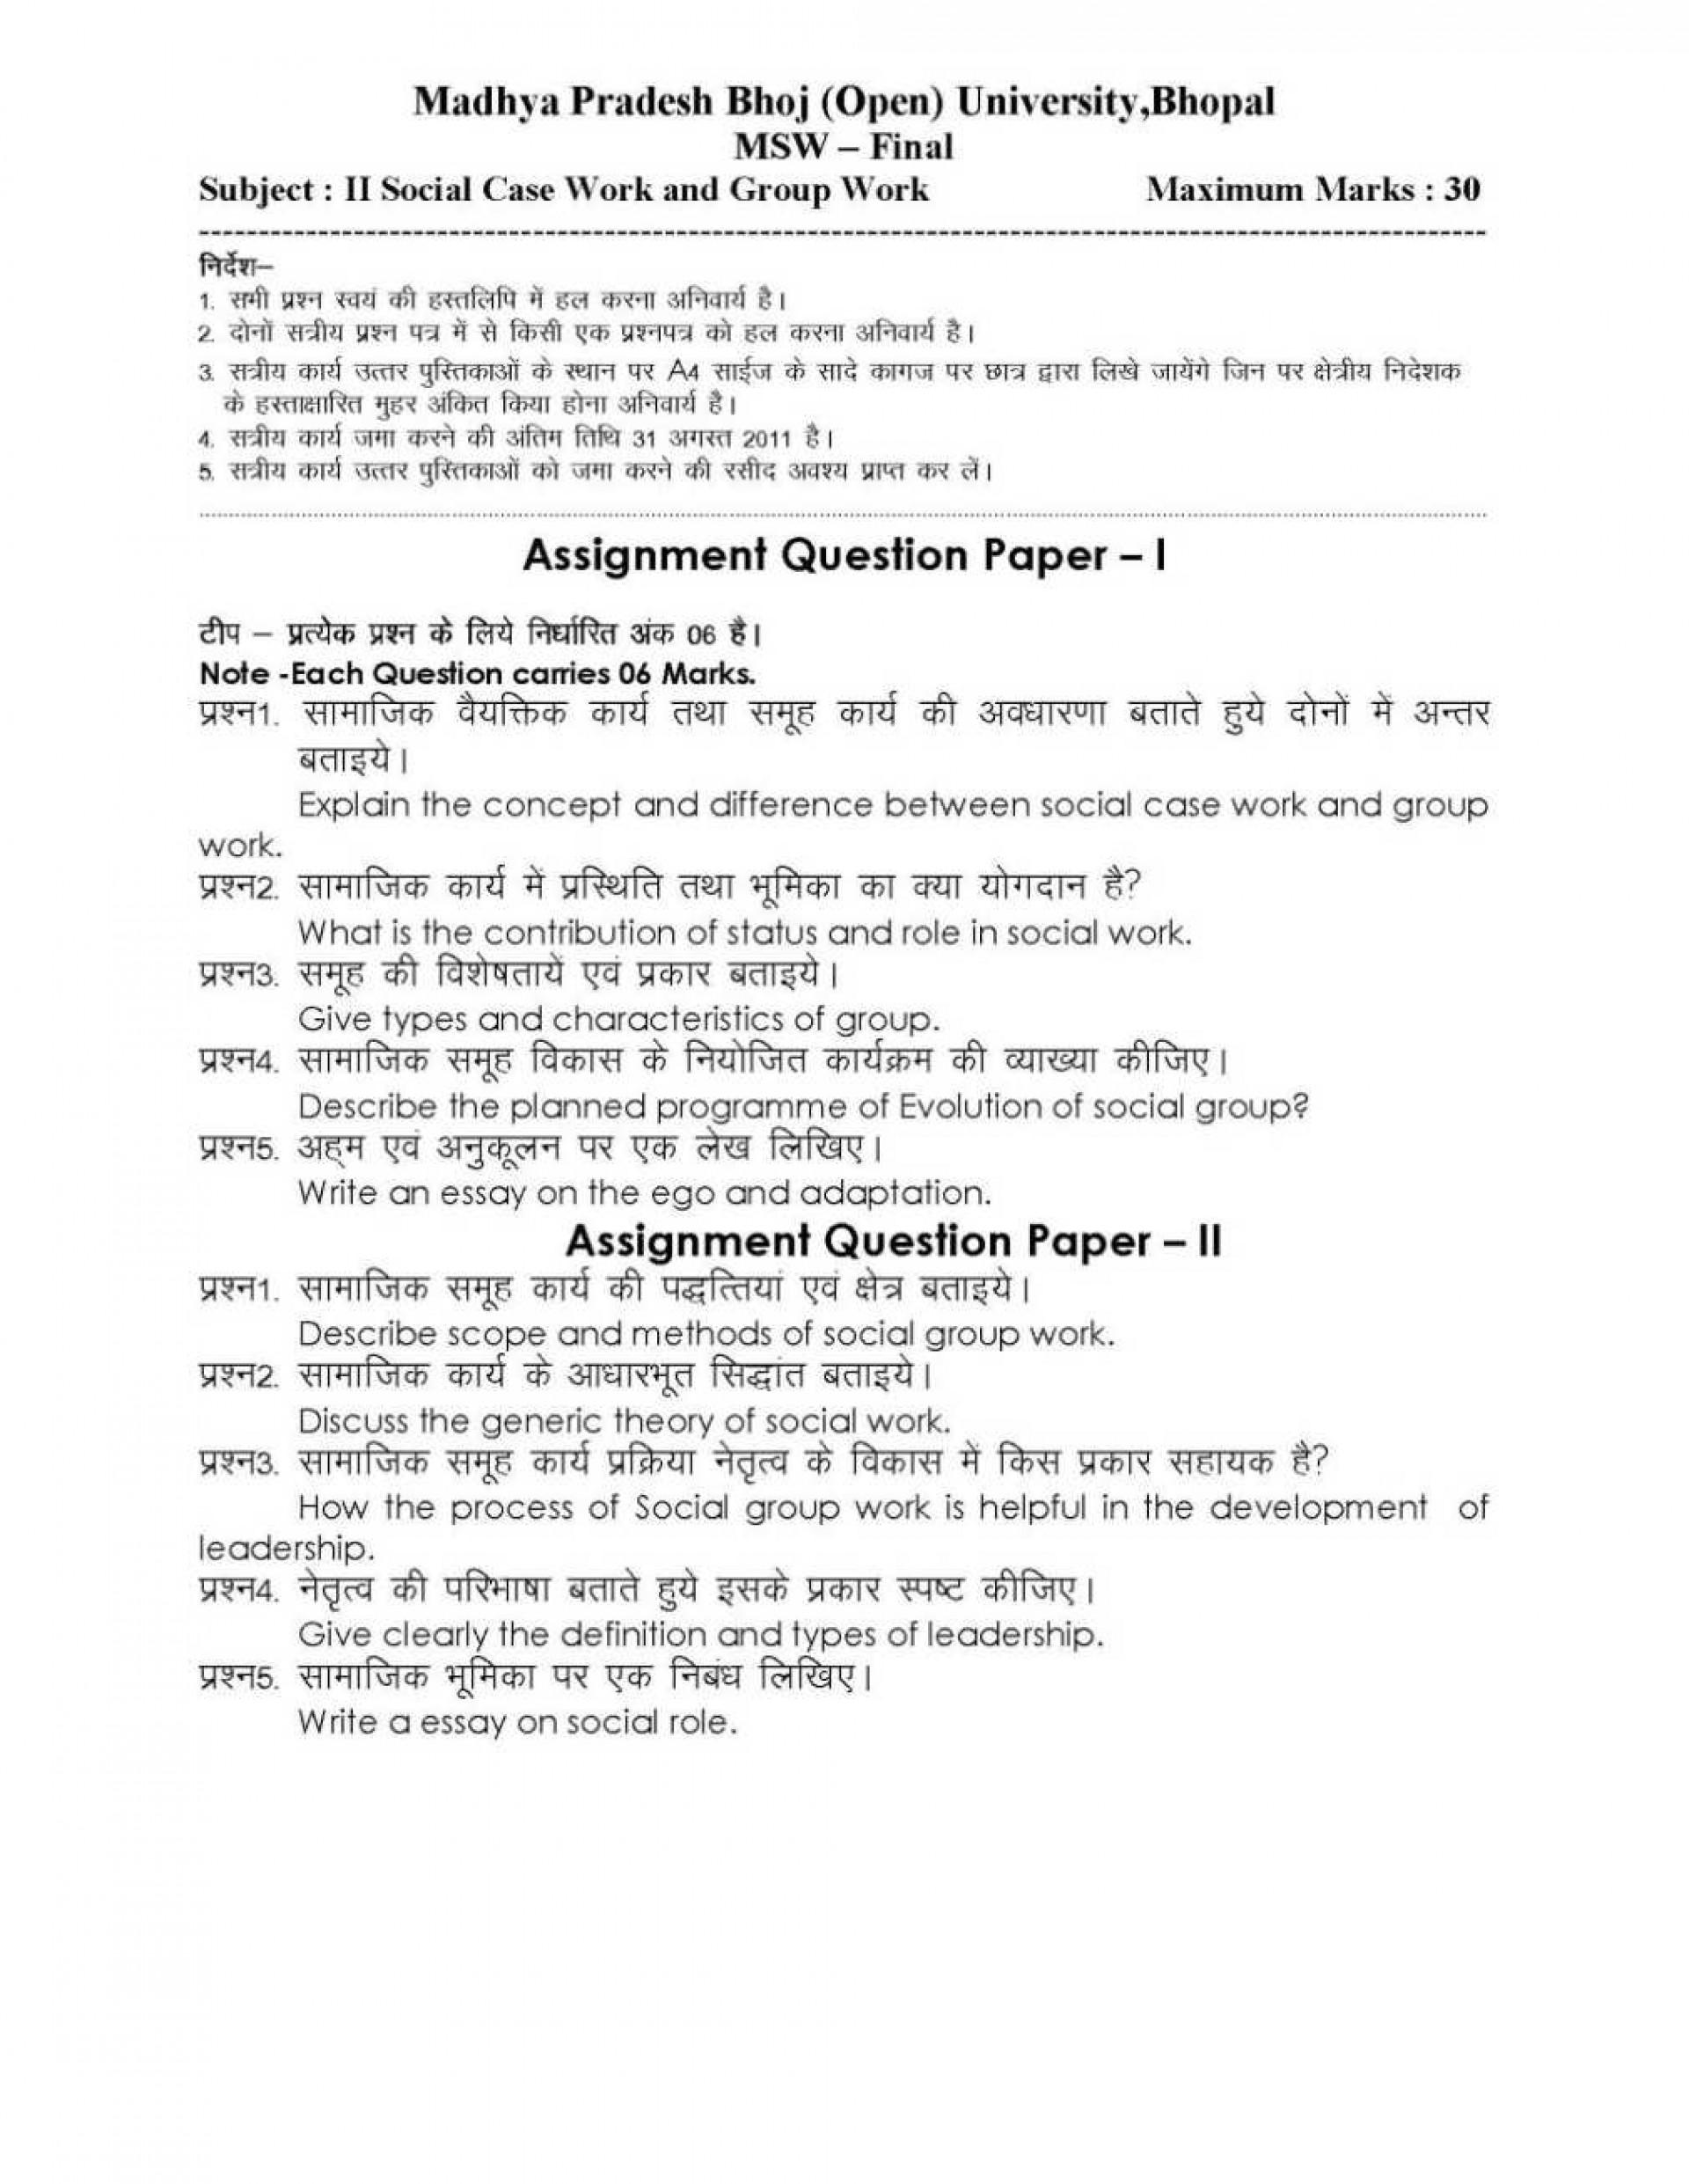 009 Leadership Essays Essay Example Bhoj University Bhopal Msw Striking Mba Samples Pdf 1920